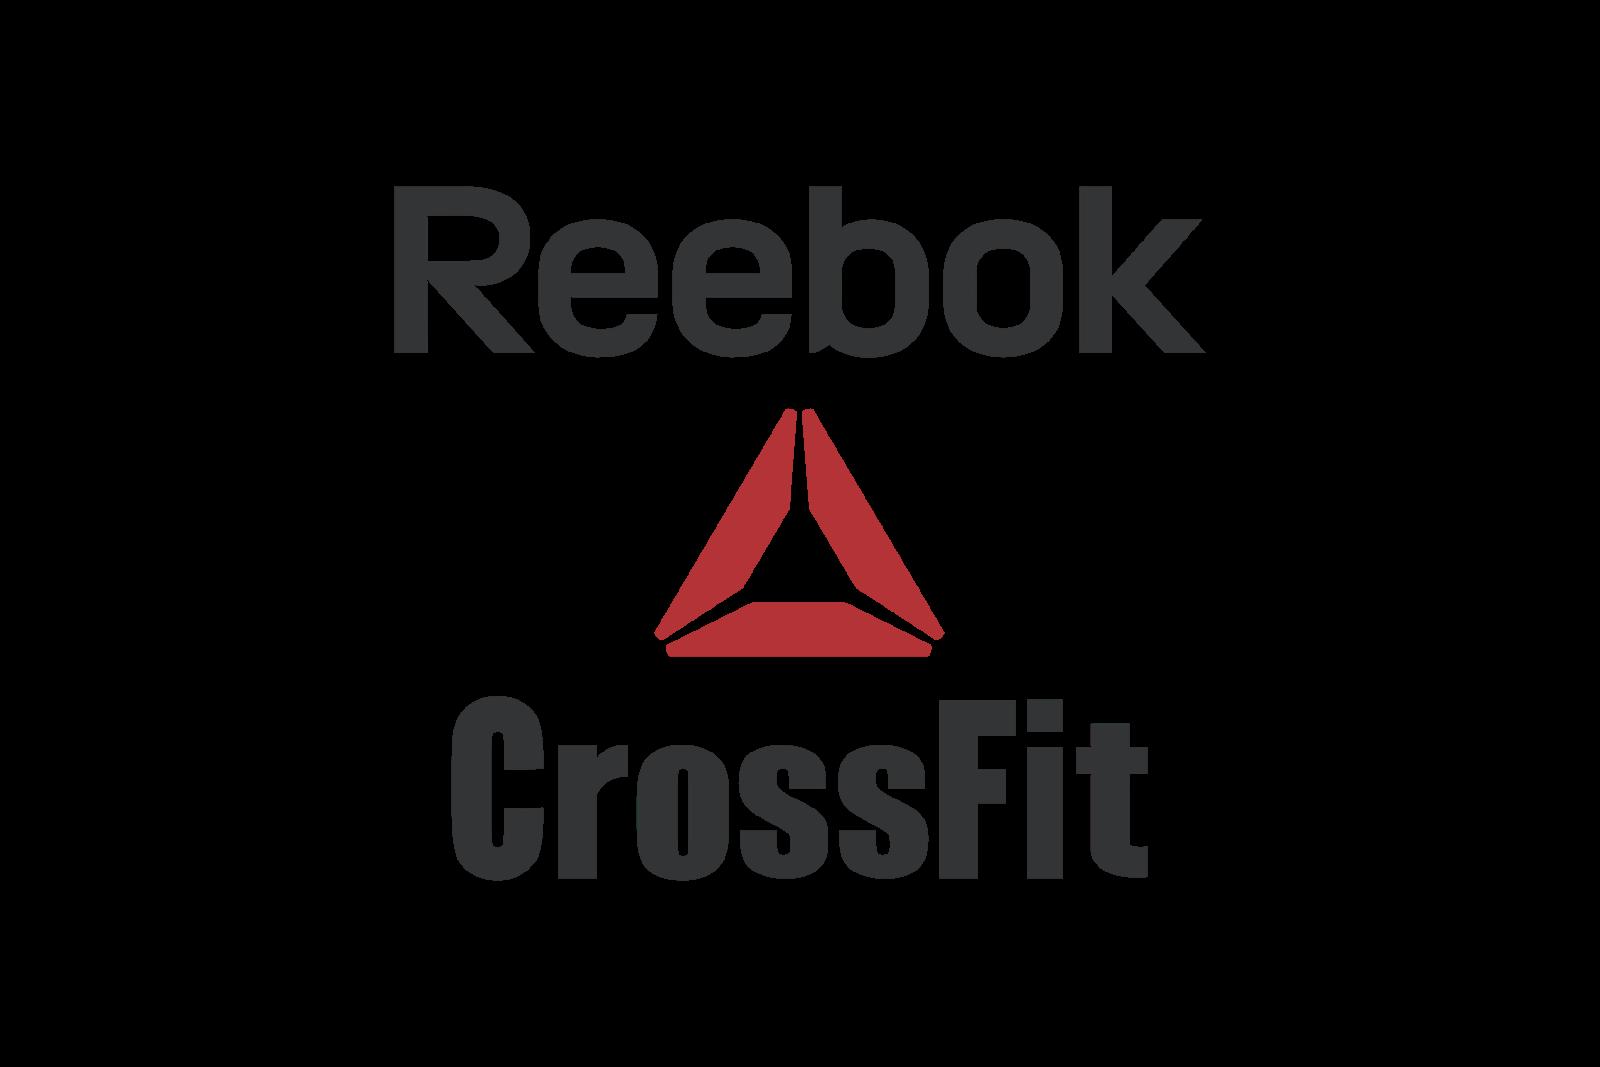 Reebok Png Reebok Crossfit Logo